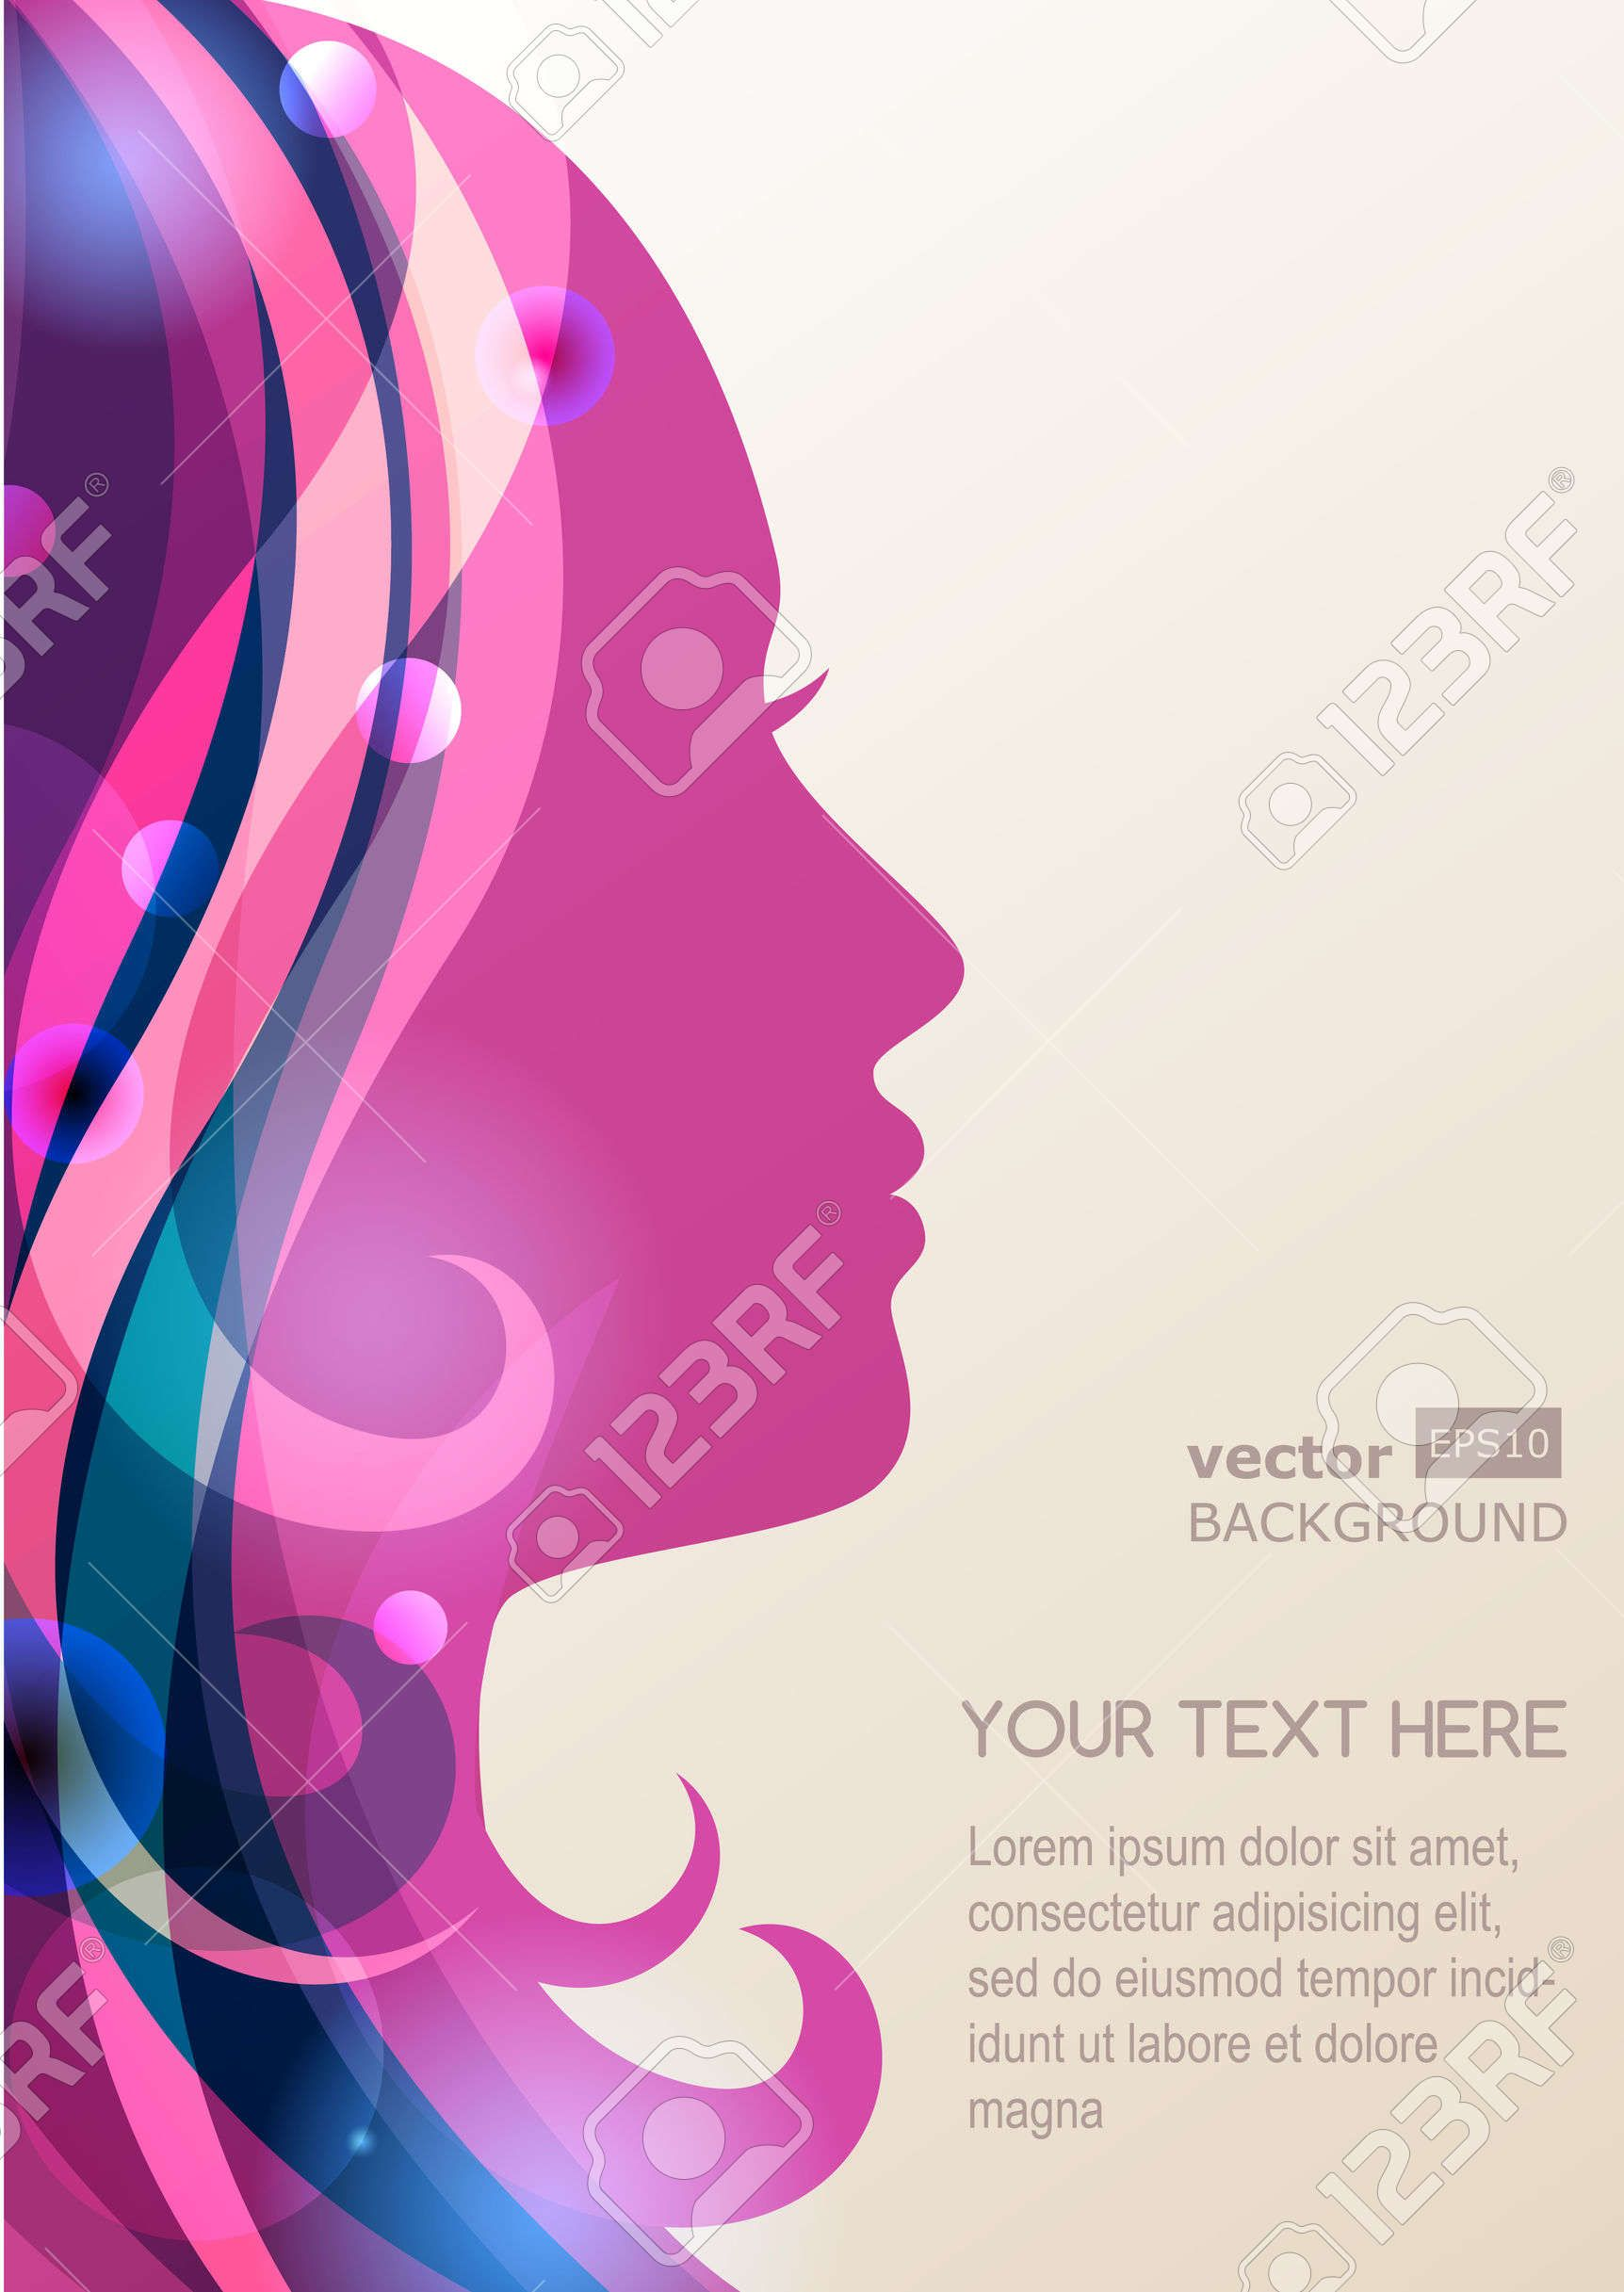 imagenes animadas para salon de belleza